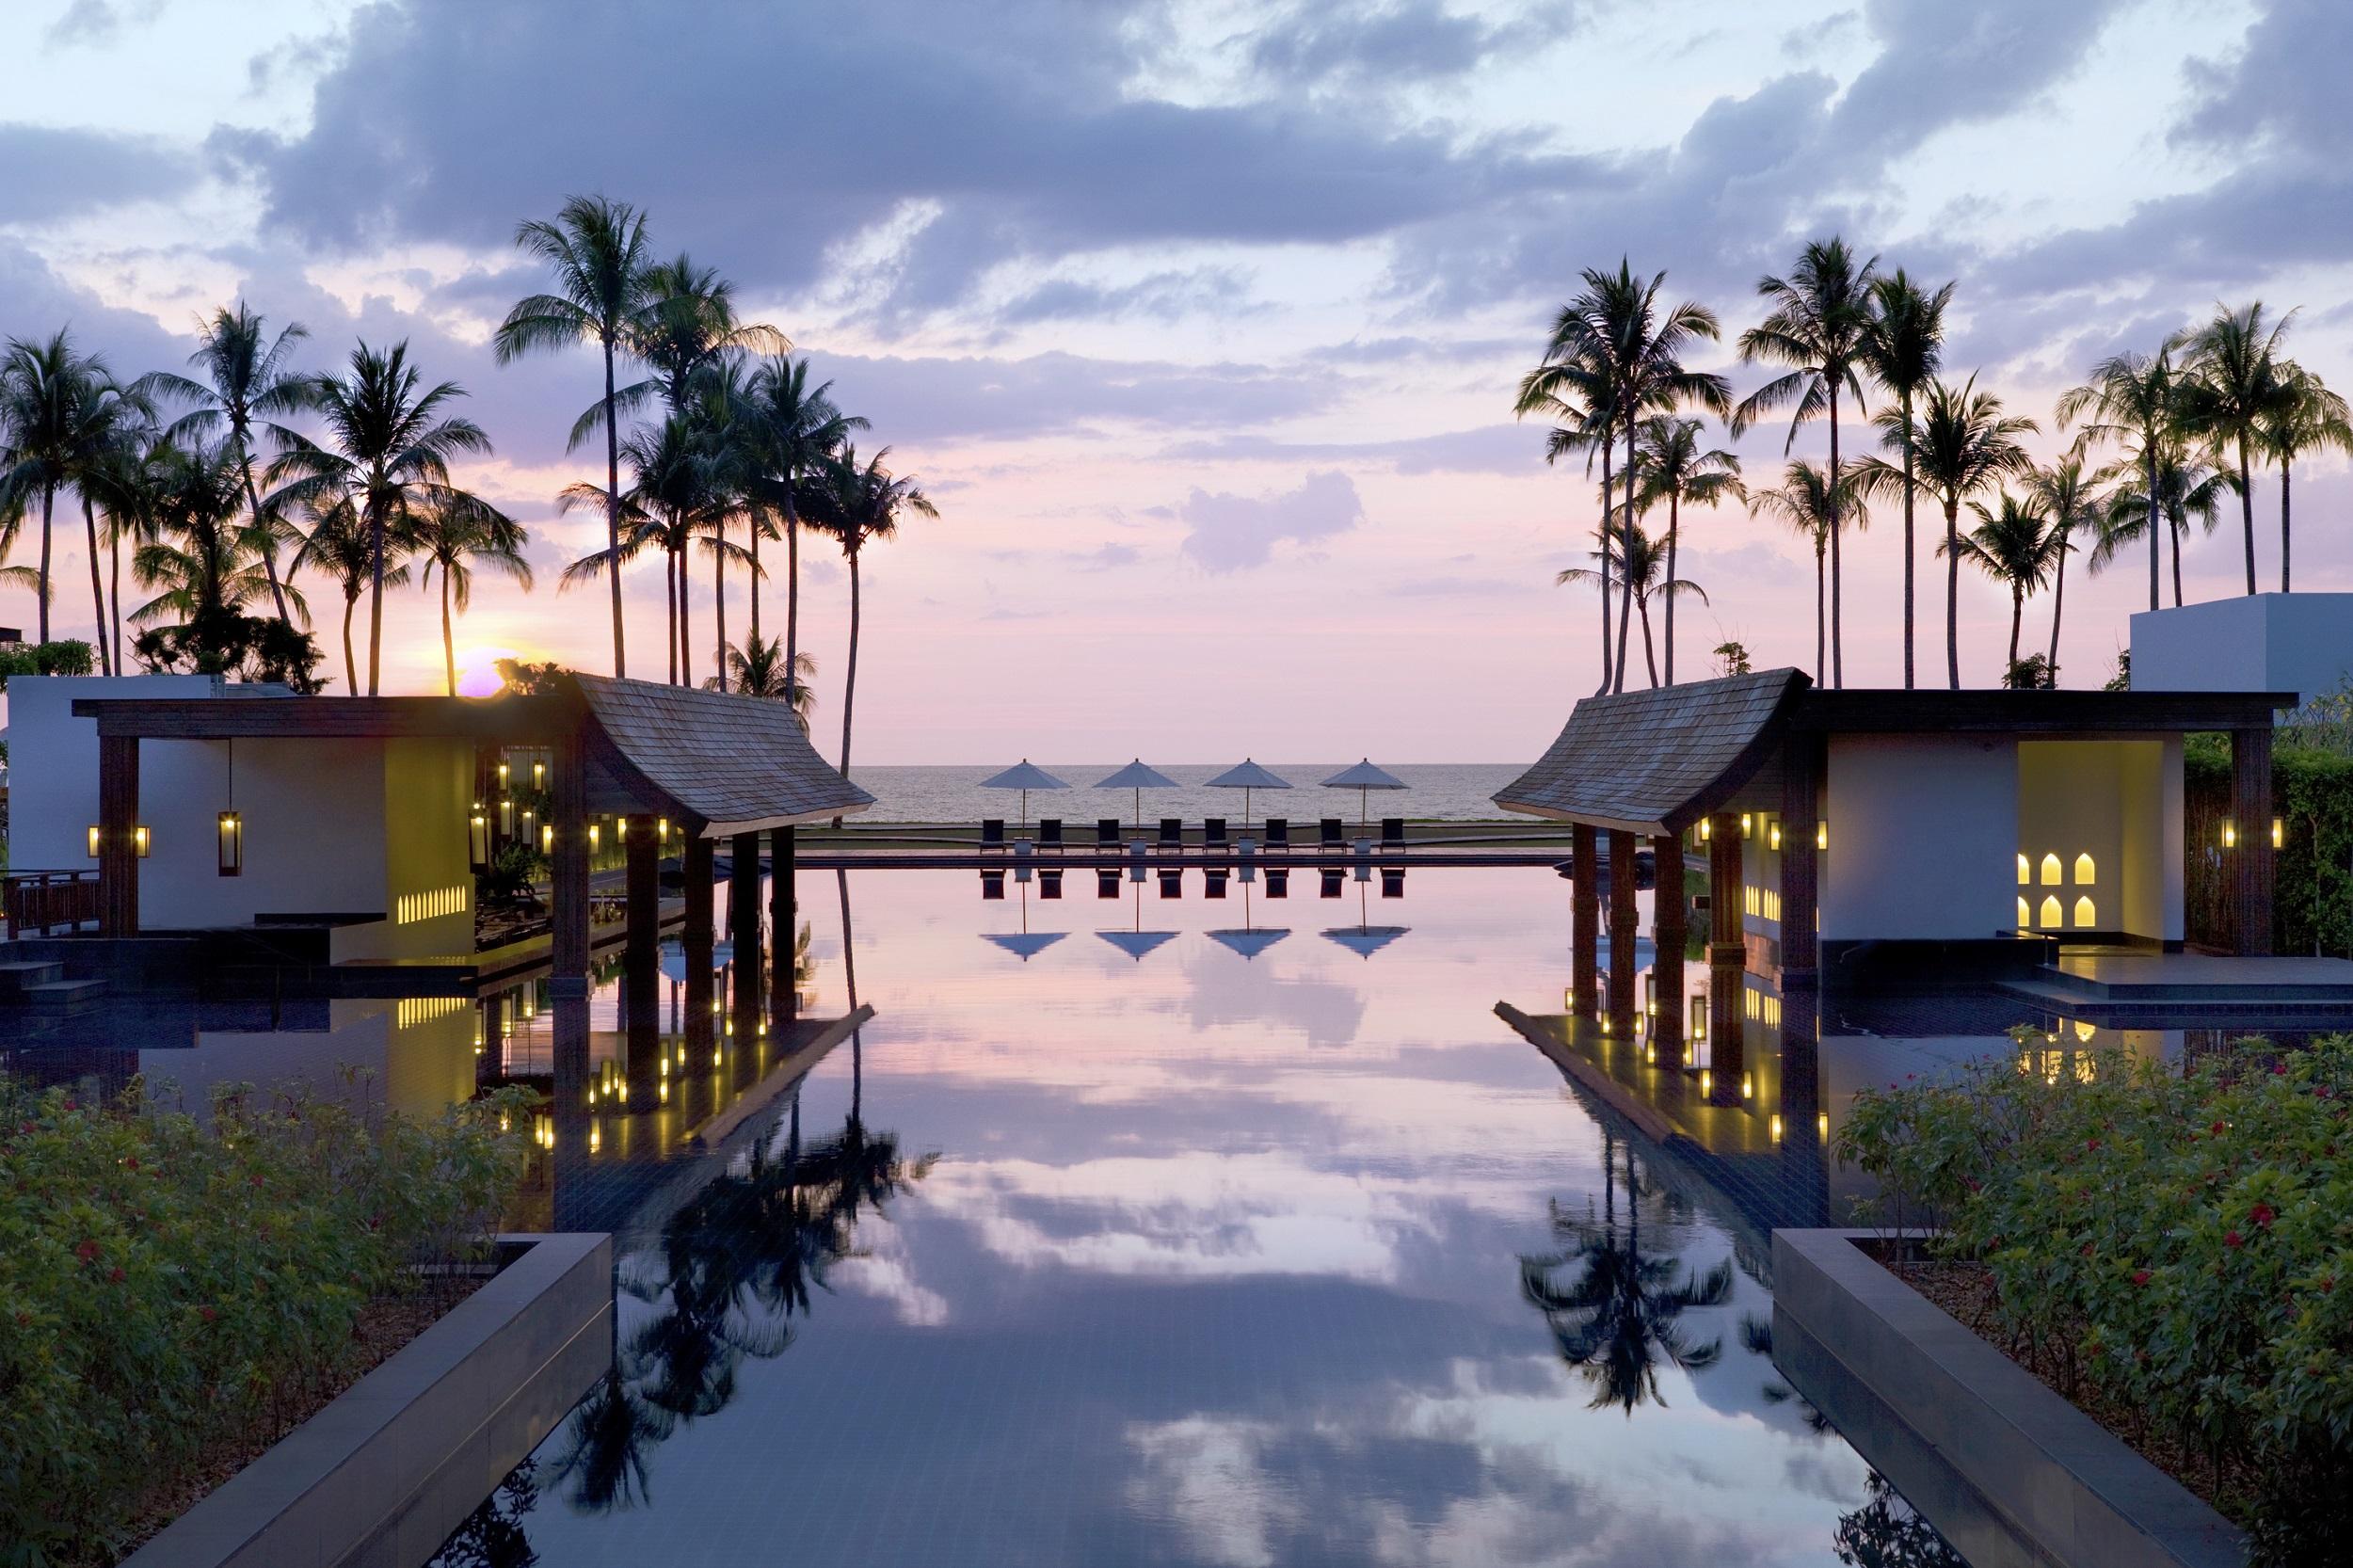 JW Marriott Khao Lak Resort & Spa - Sunset at Infinity Pool